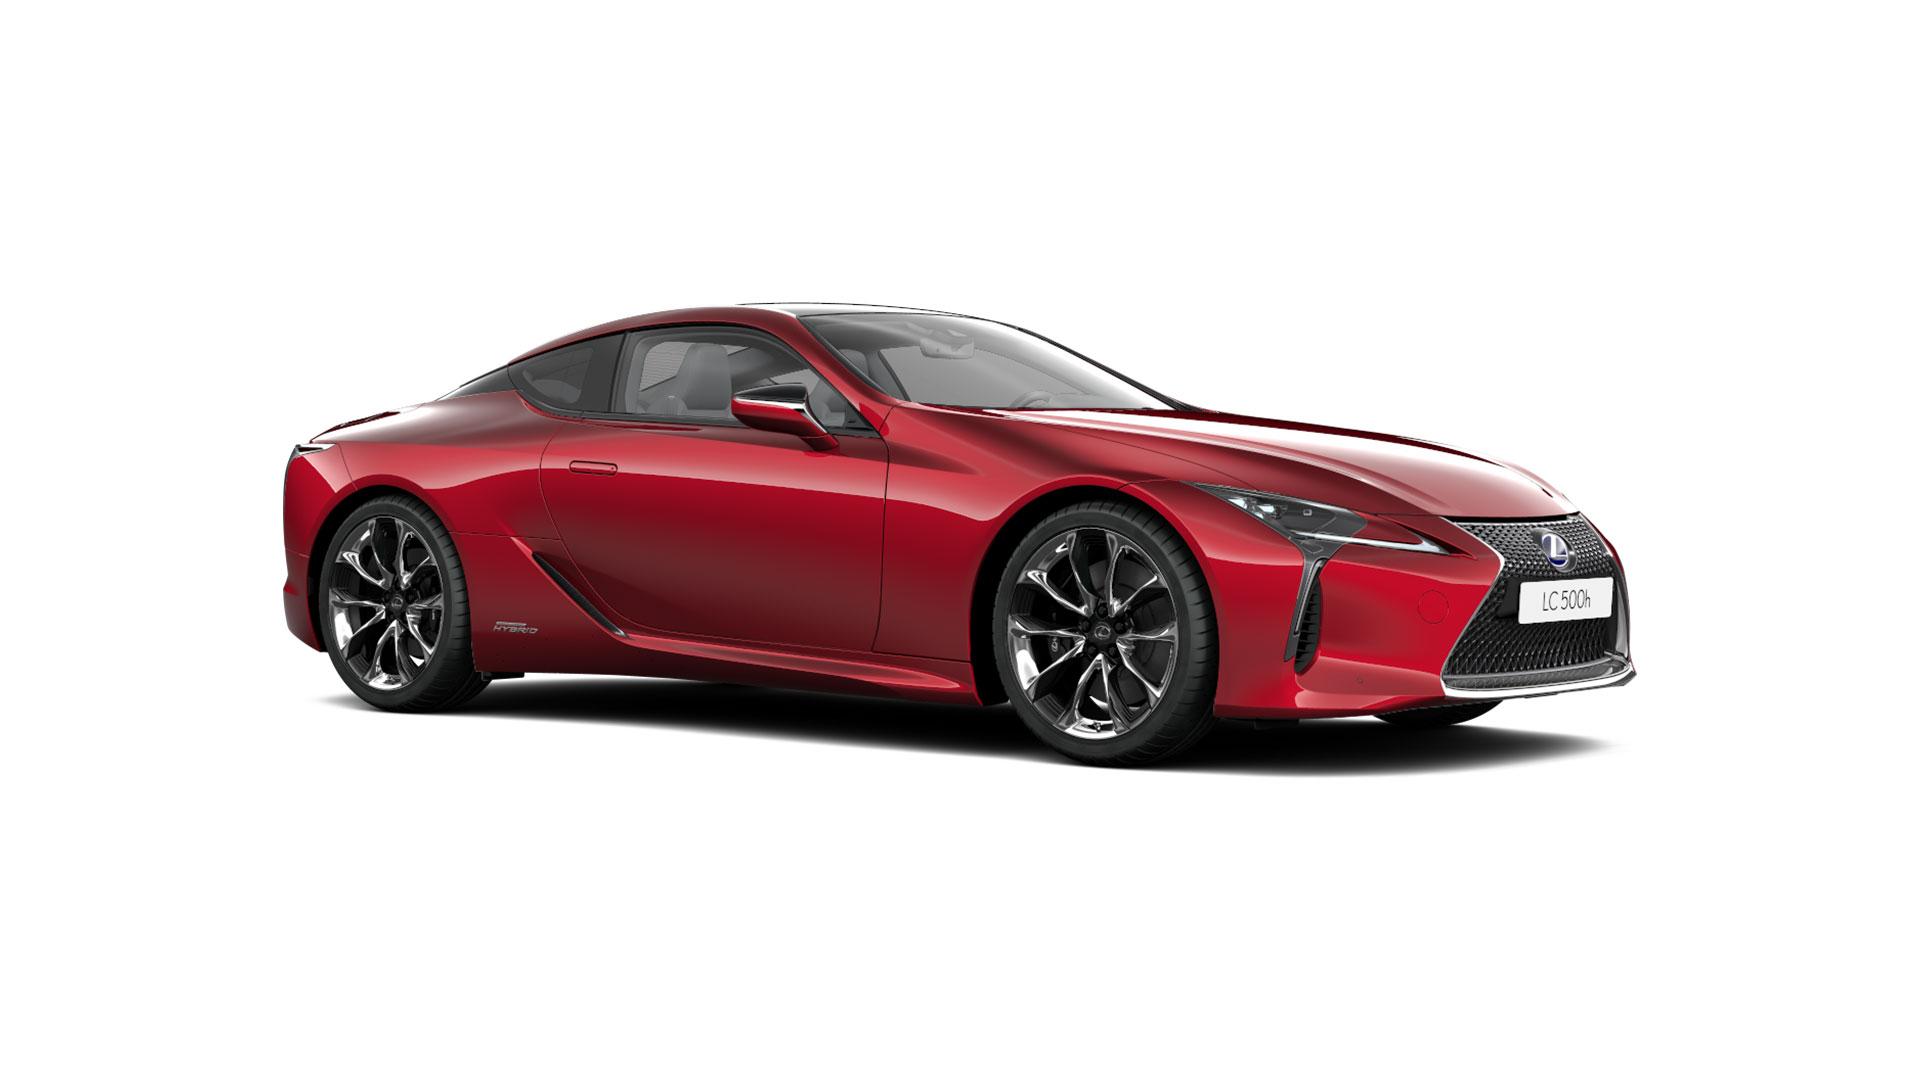 2017 lexus hybrid meet the lc ccis